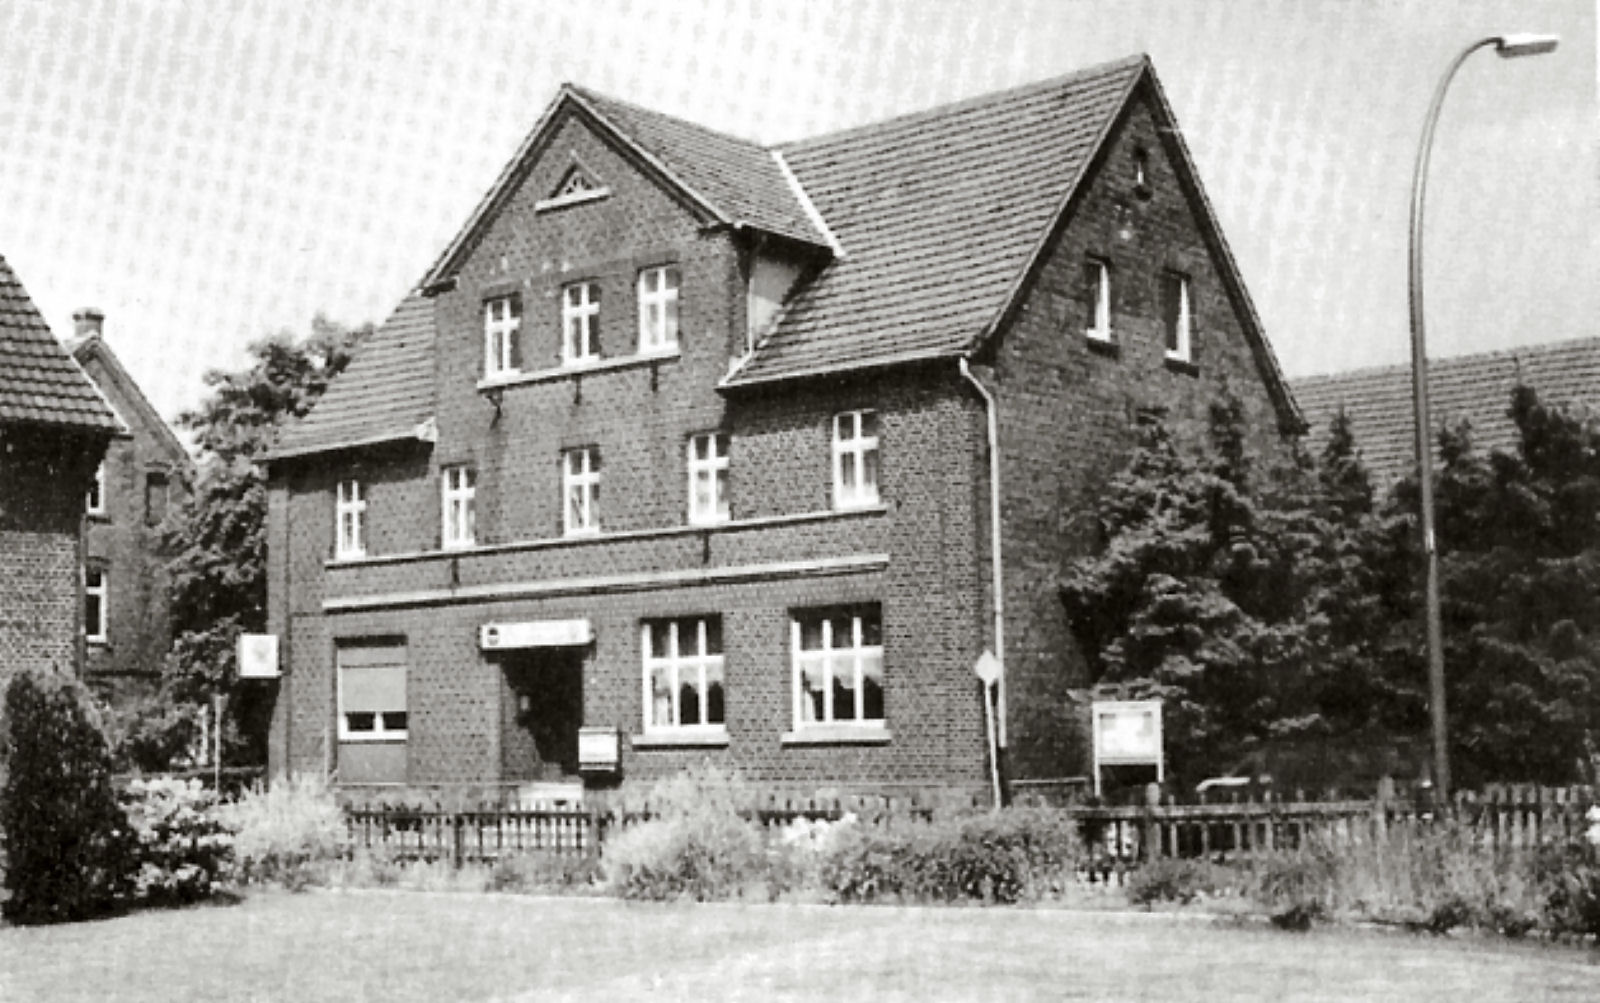 Gaststätte Stegemann, Saal, Kegelbahn, Lembeck